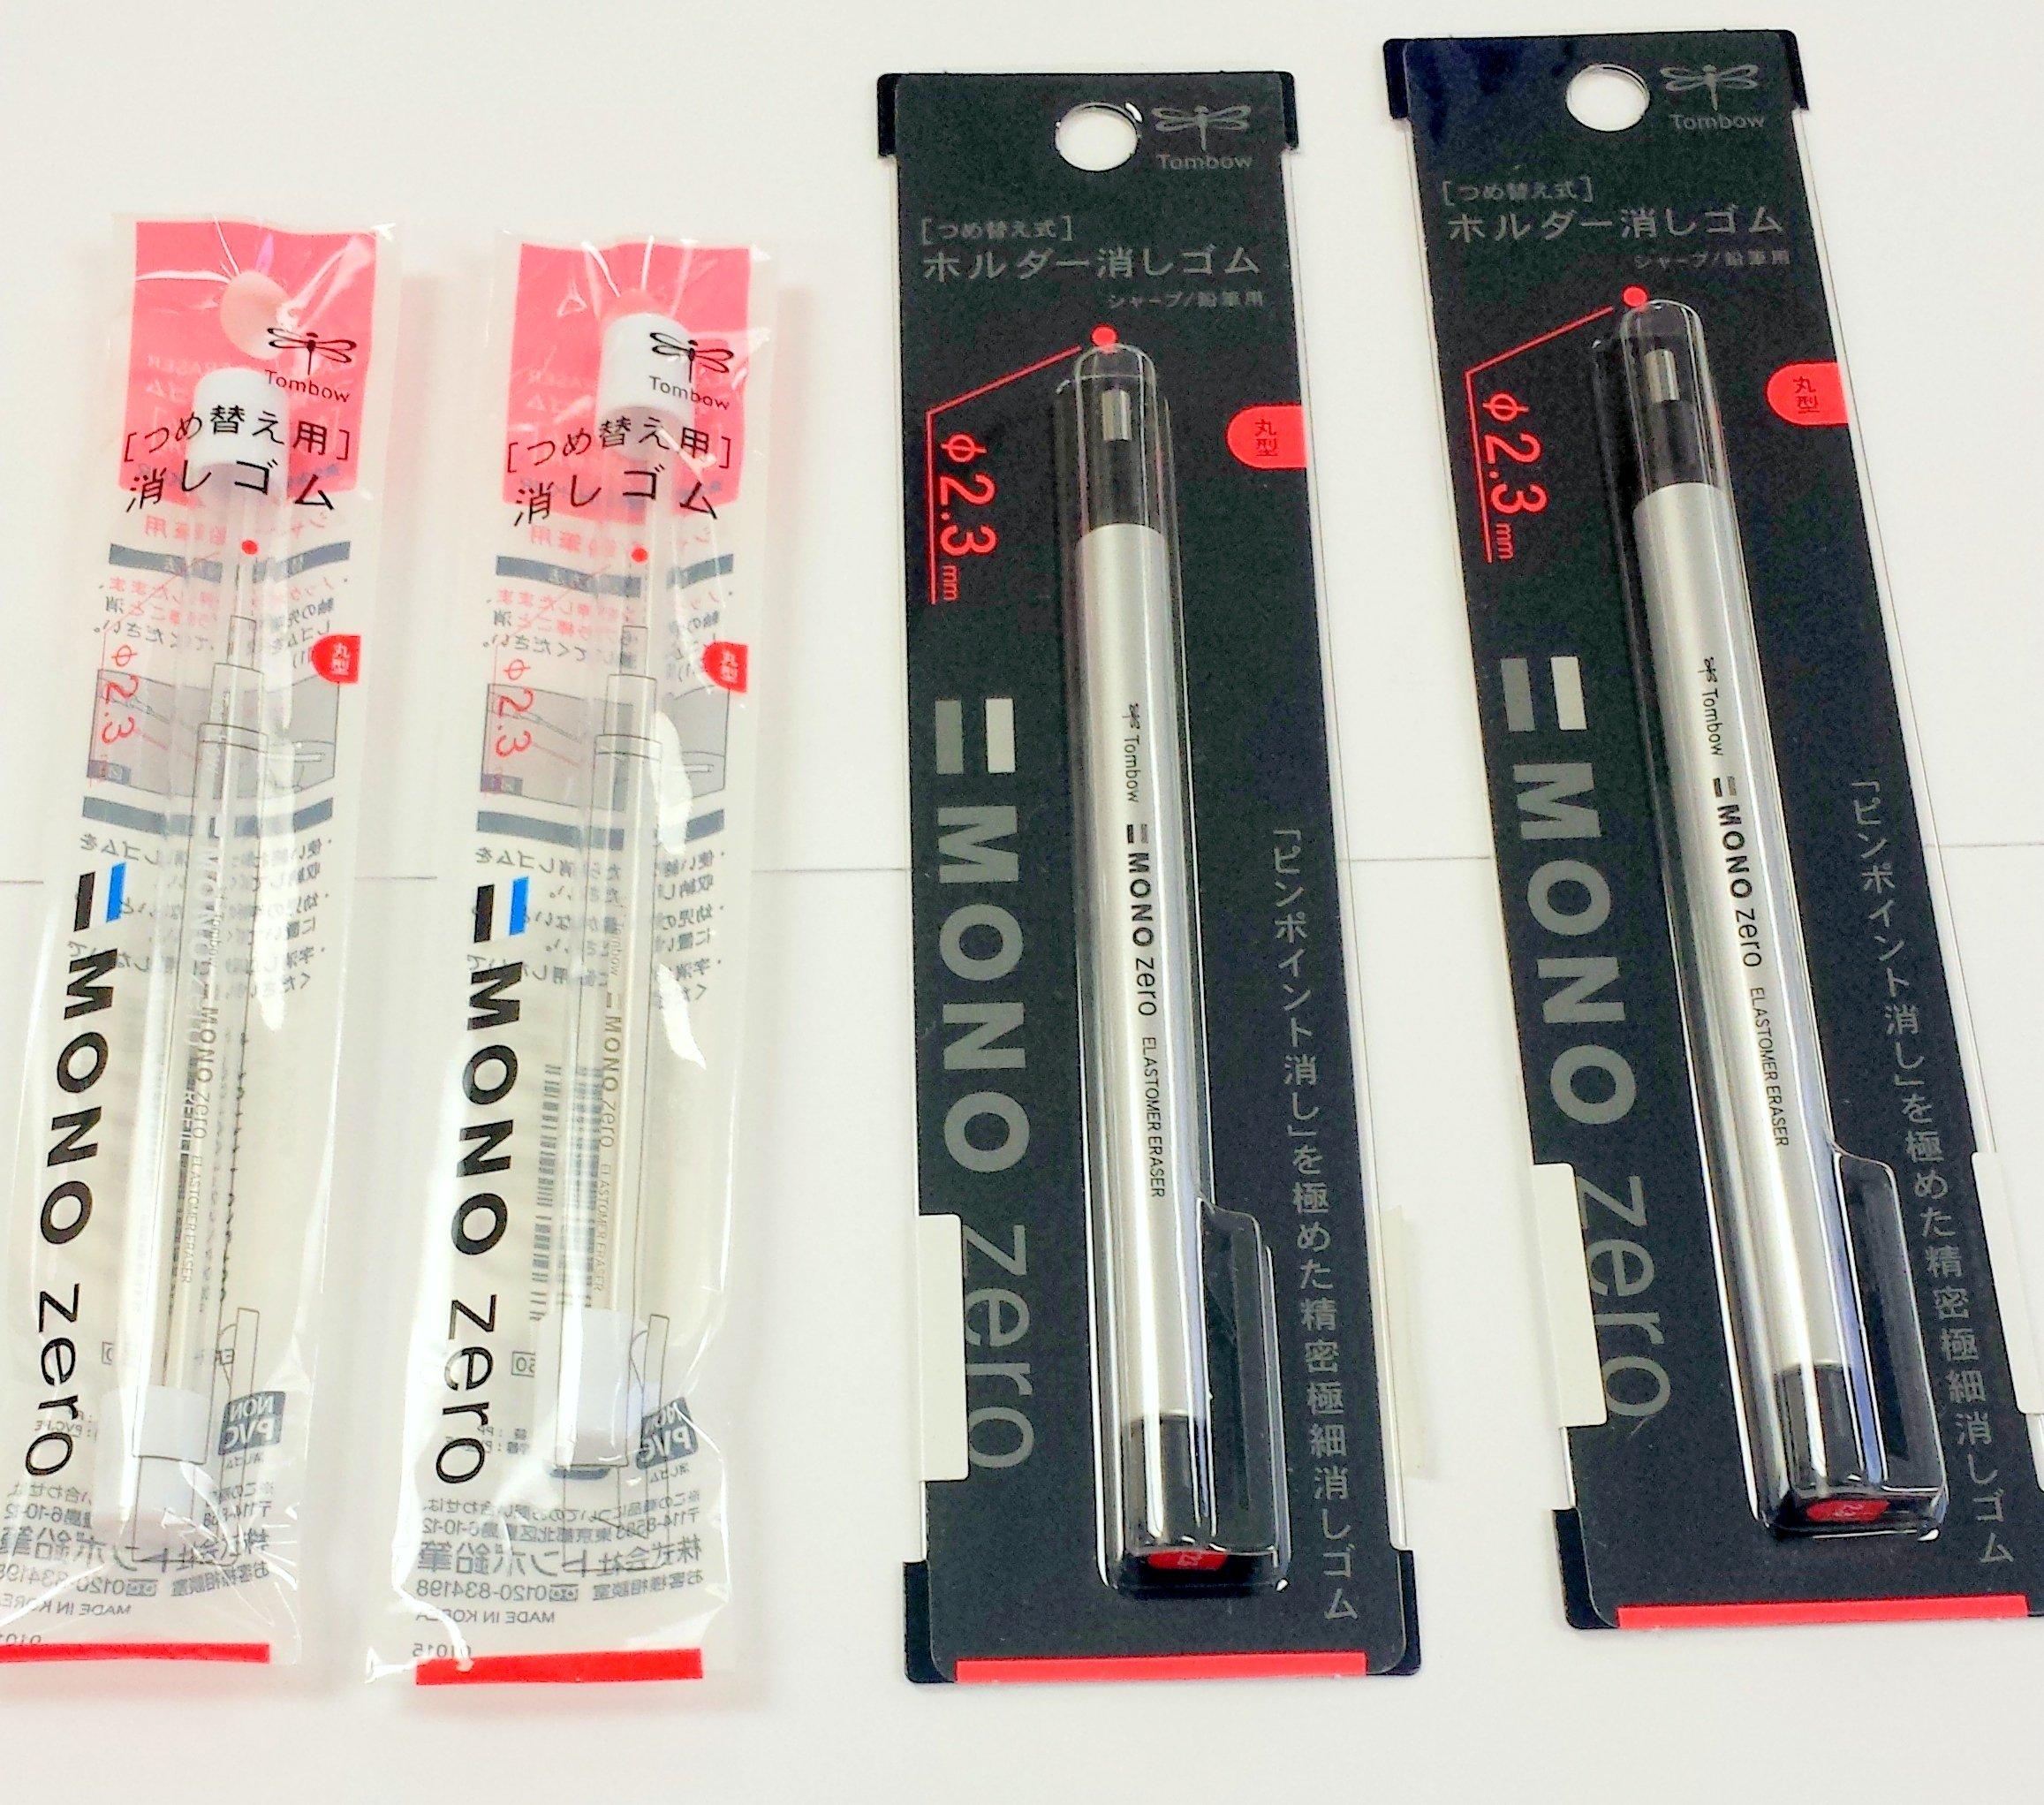 Value Pack of 2 Tombow Mono Zero Erasers & 4 refills